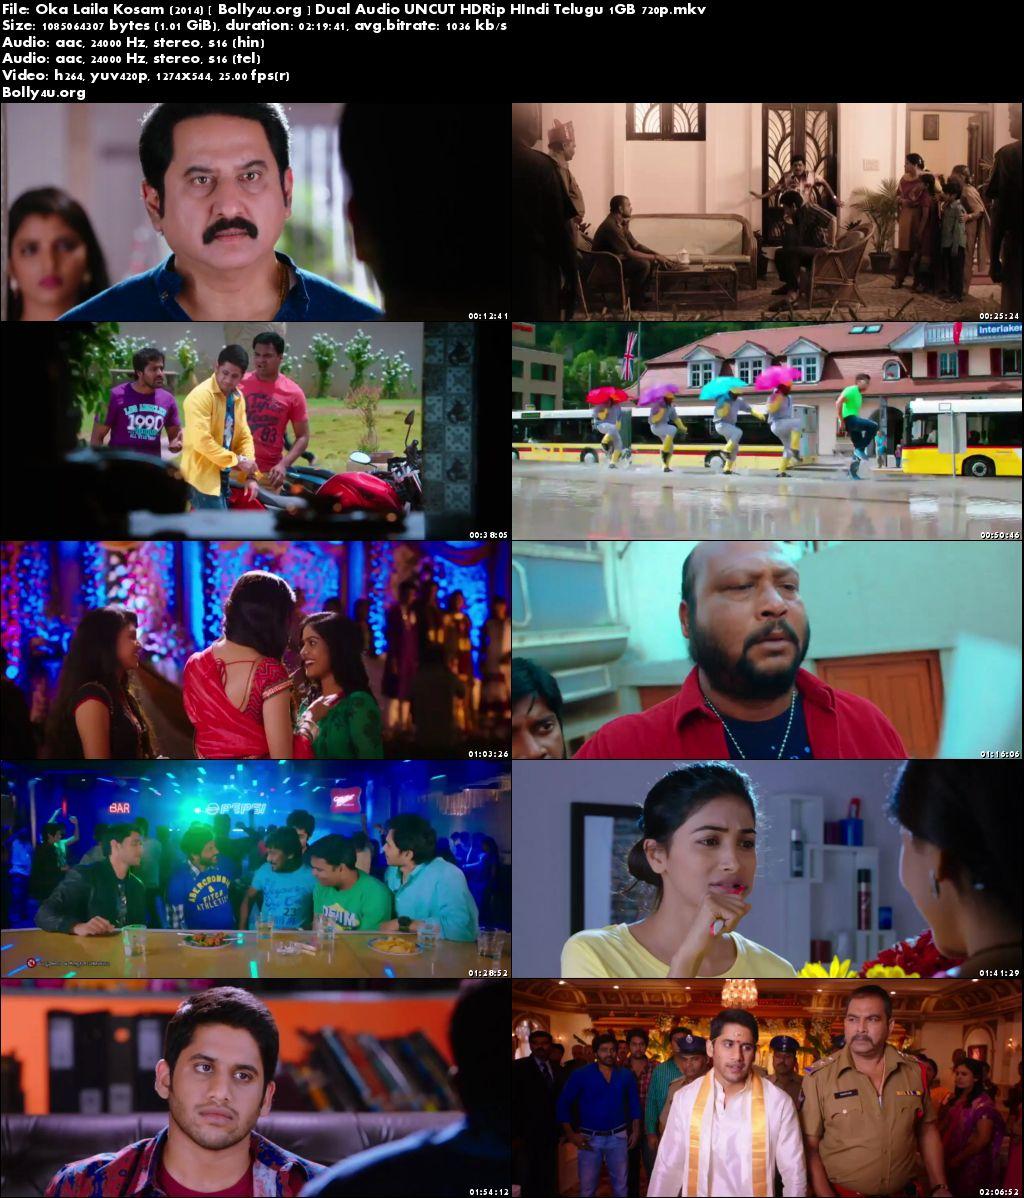 Oka Laila Kosam 2014 HDRip 400Mb Hindi Dubbed Dual Audio 480p Download